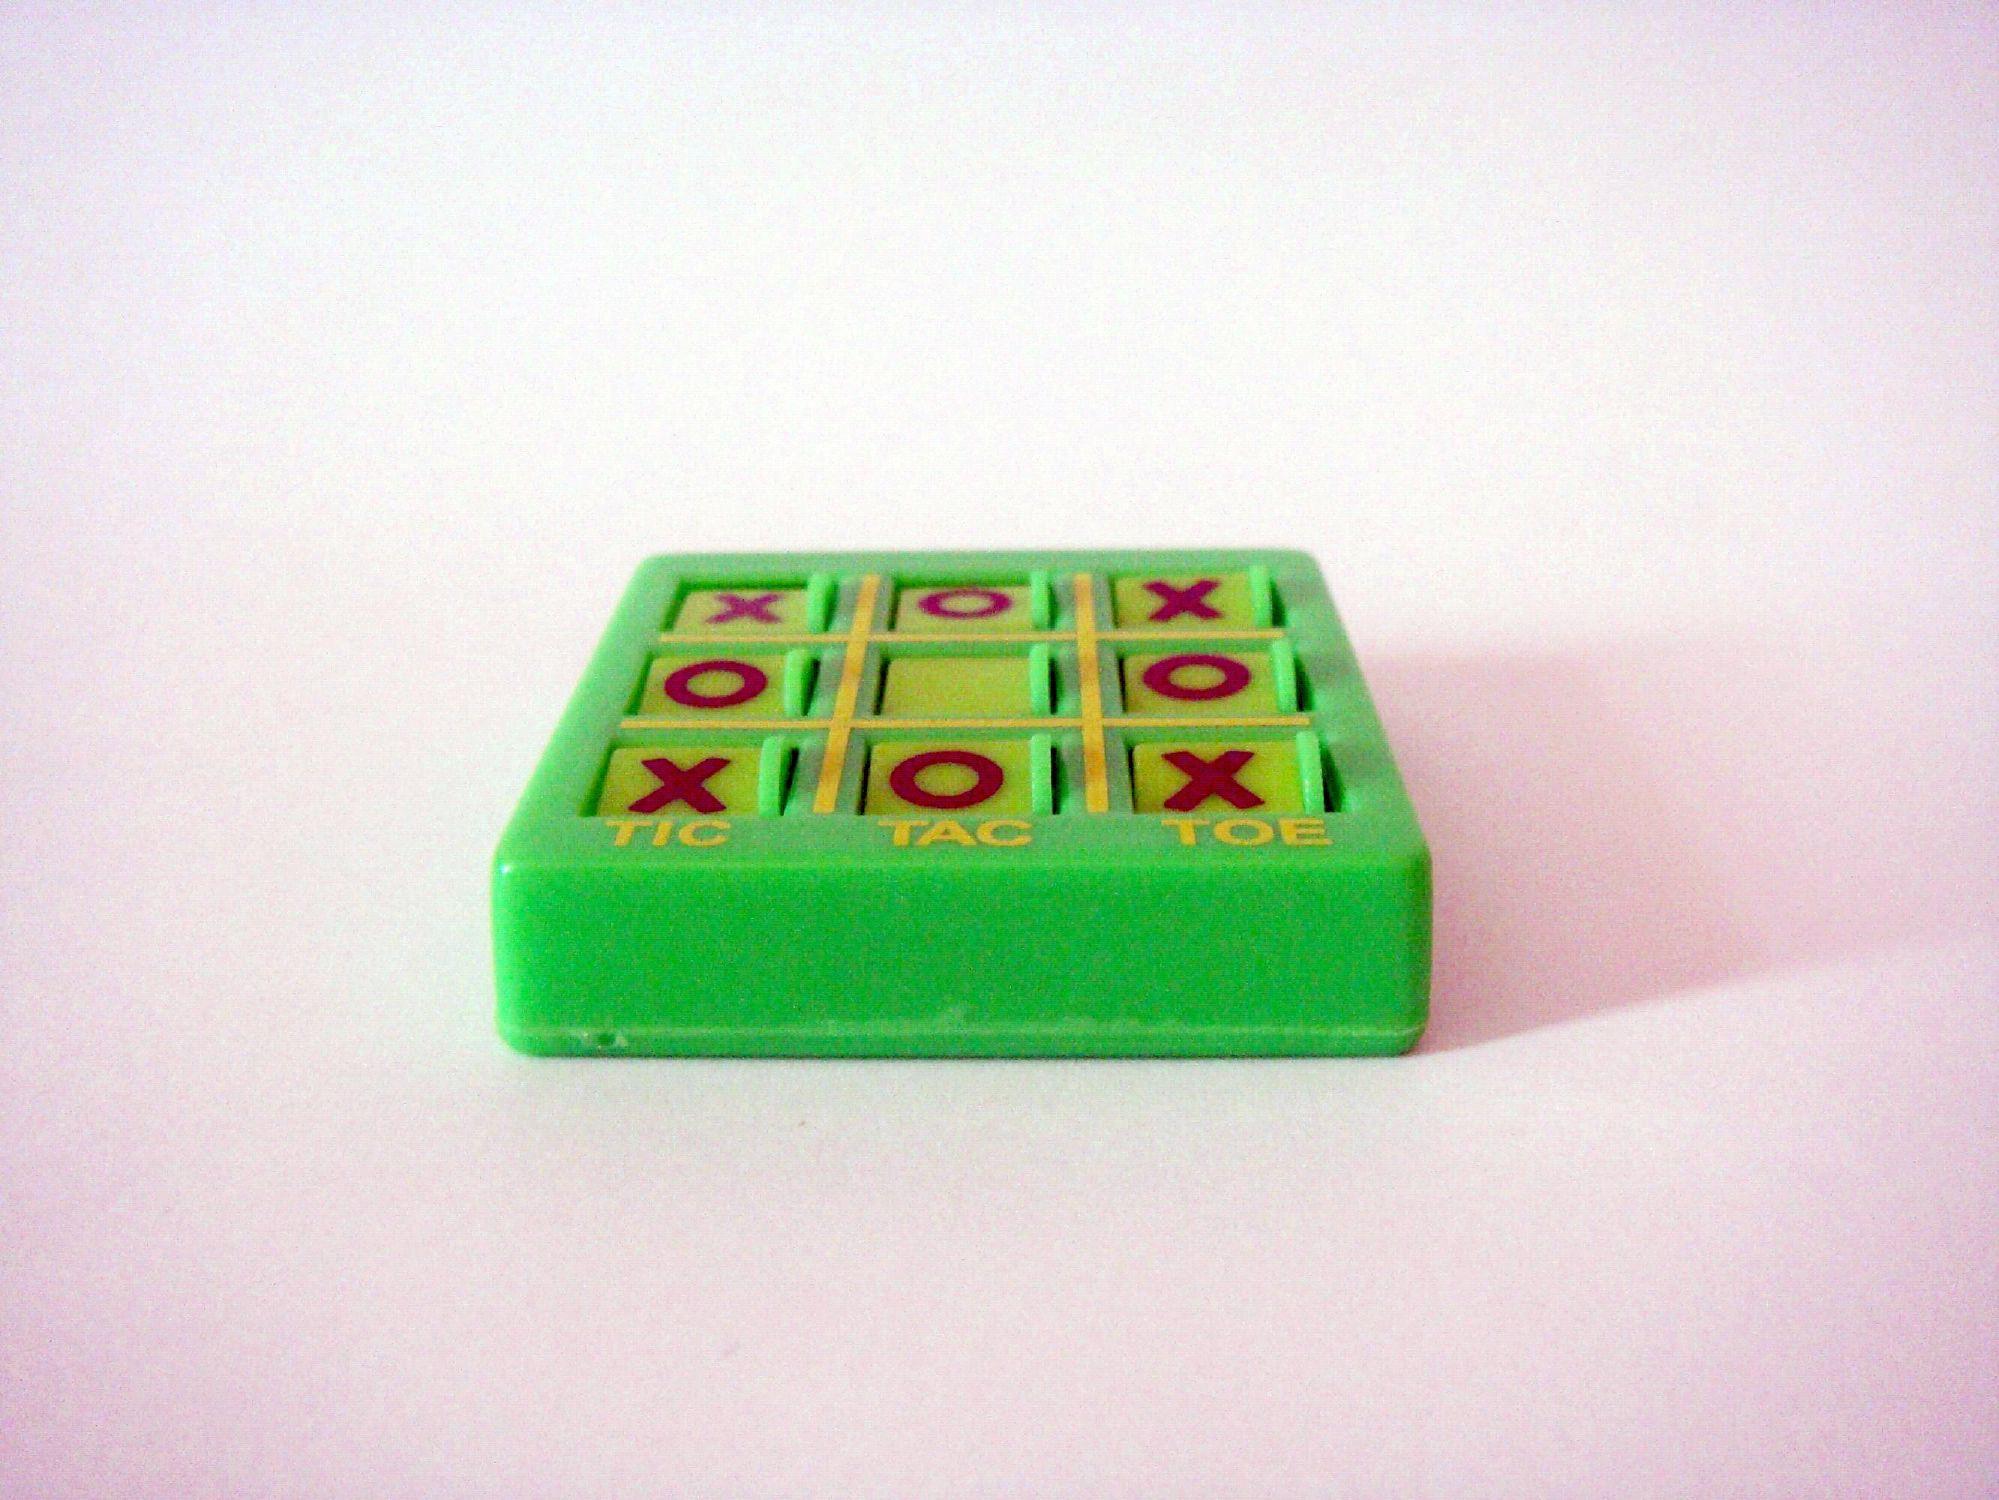 Tic Tac Toe, Box, Entertainment, Game, Green, HQ Photo